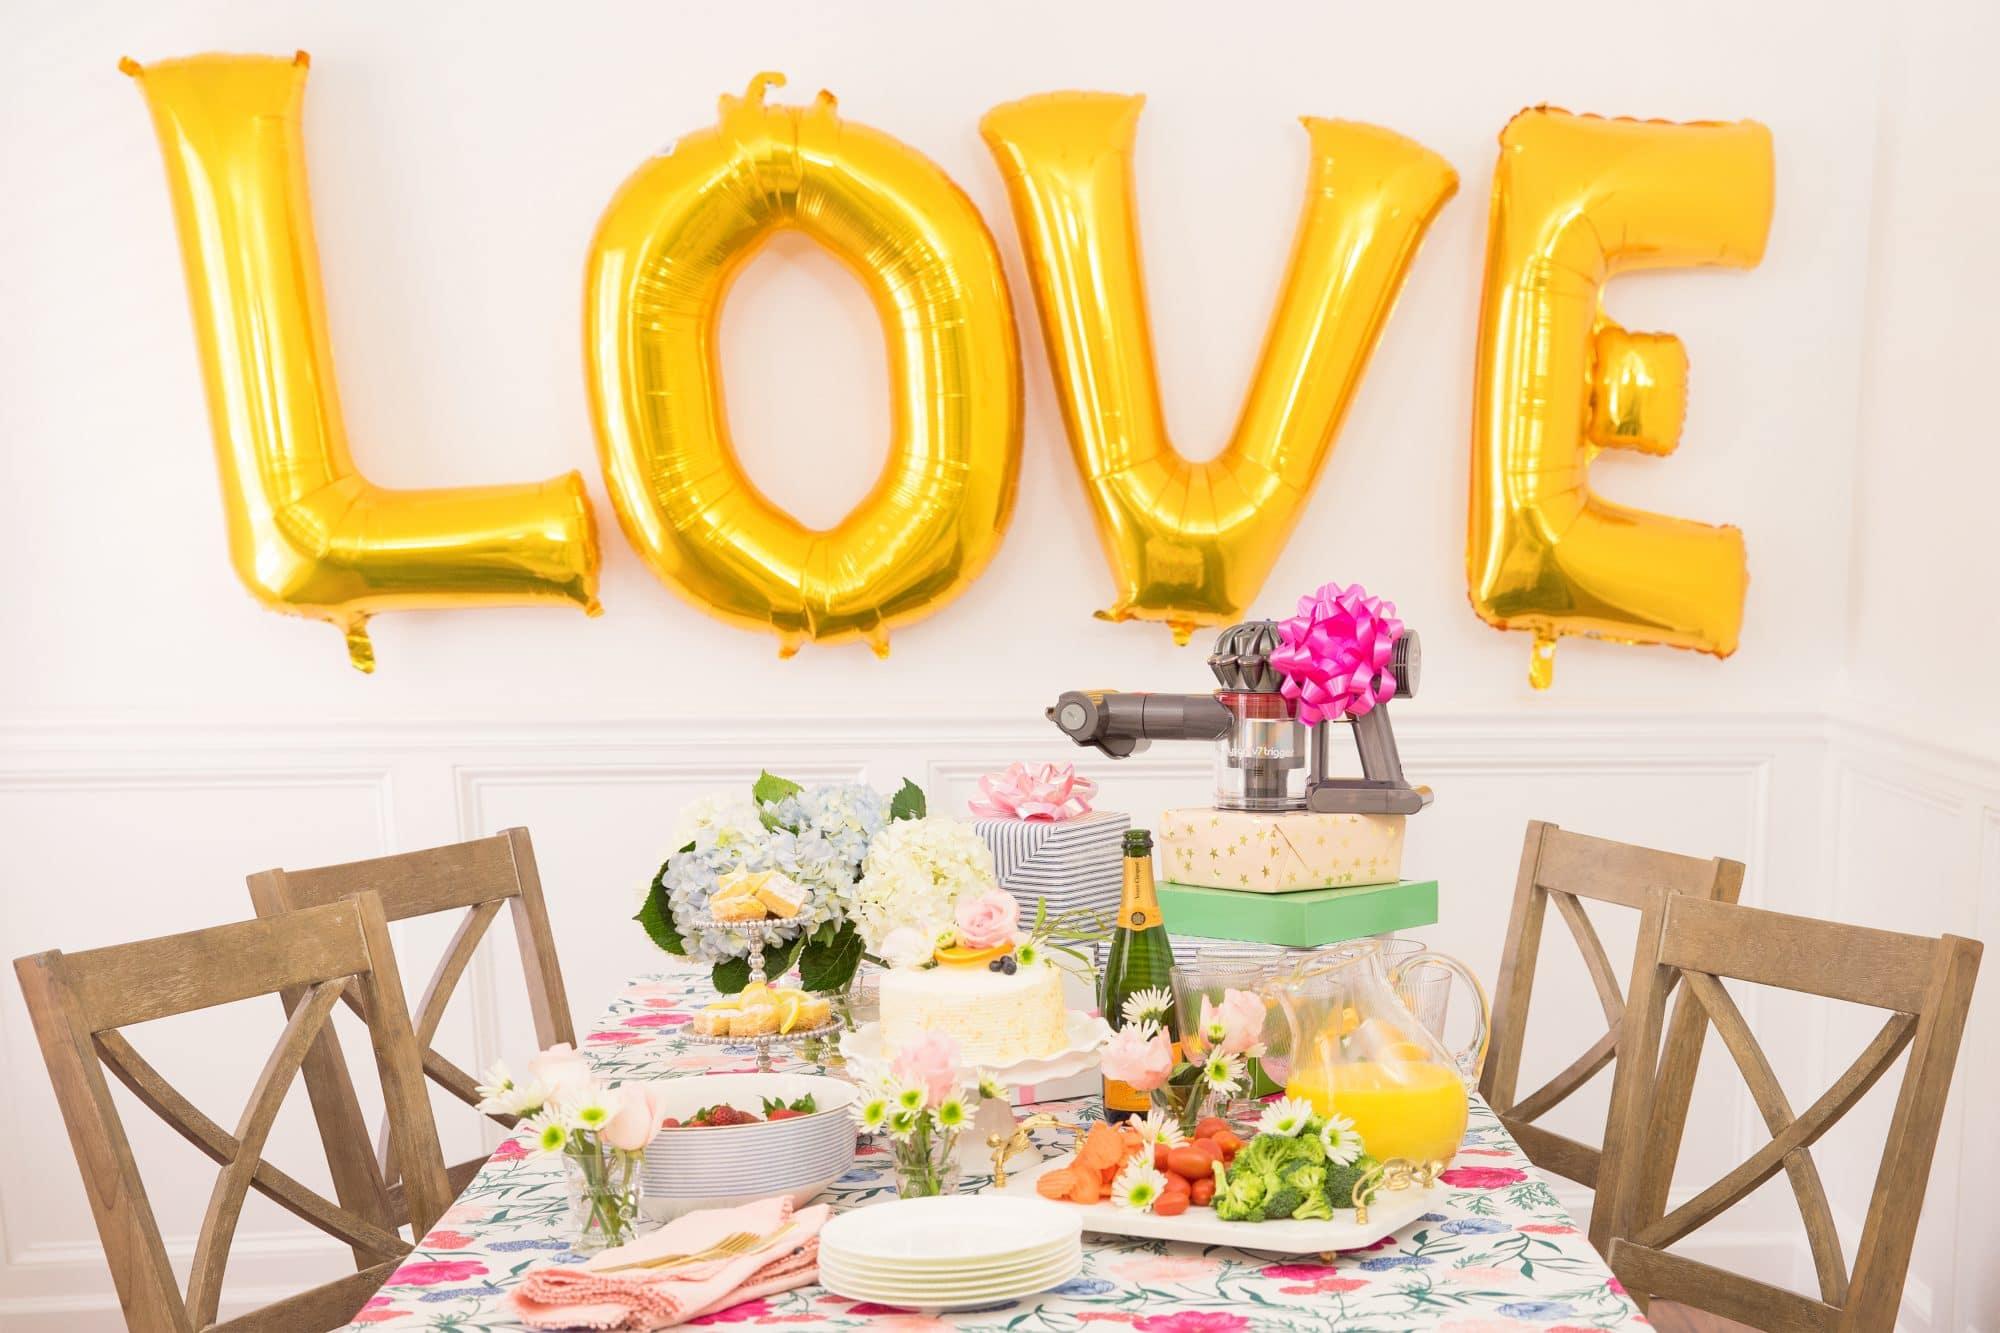 Tips For Hosting Bridal & Baby Showers   www.ashleybrookedesigns.com